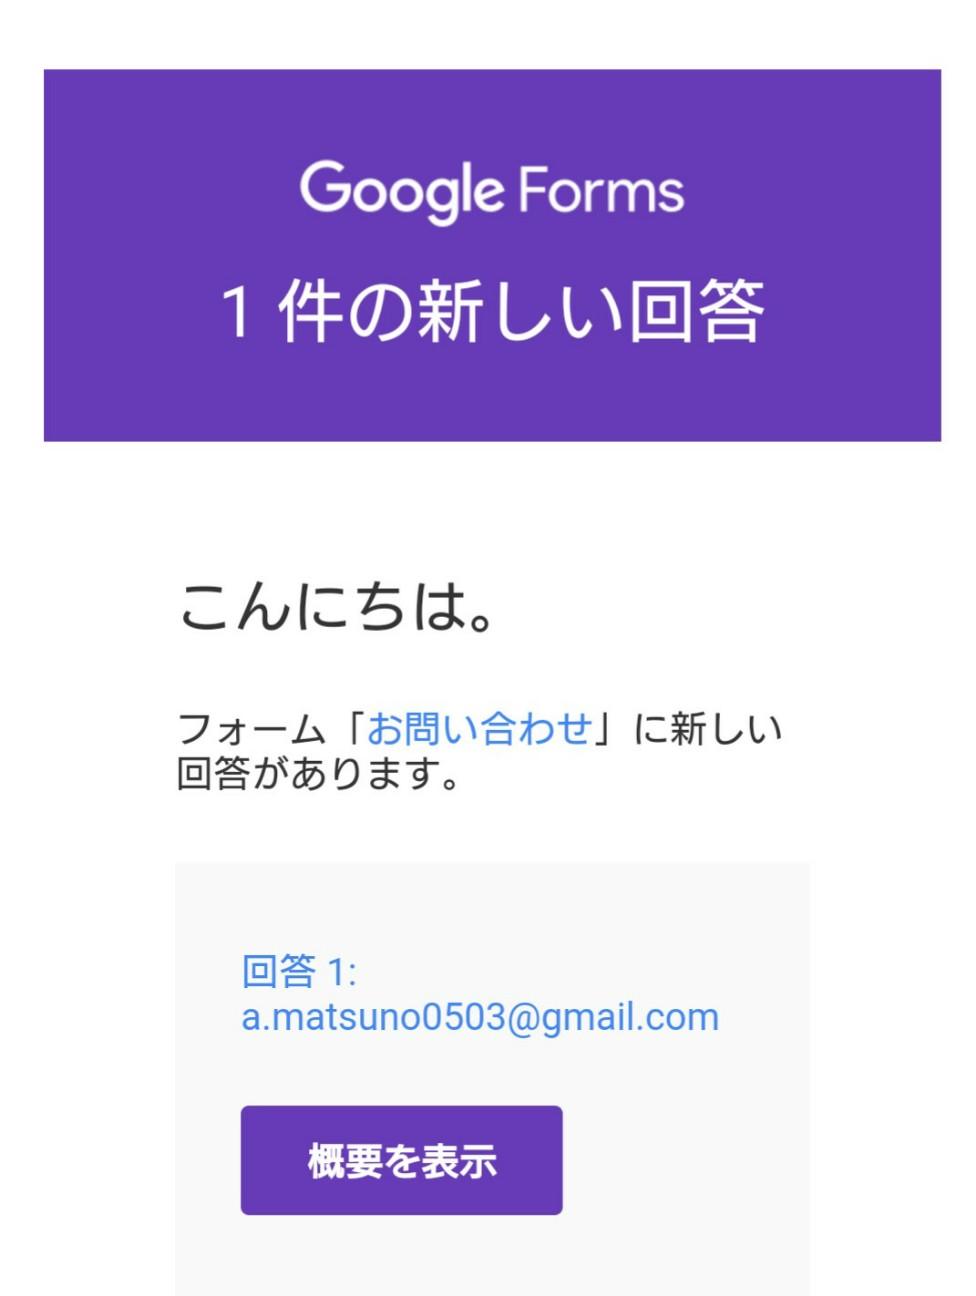 f:id:a-matsuno0503:20190207144420j:image